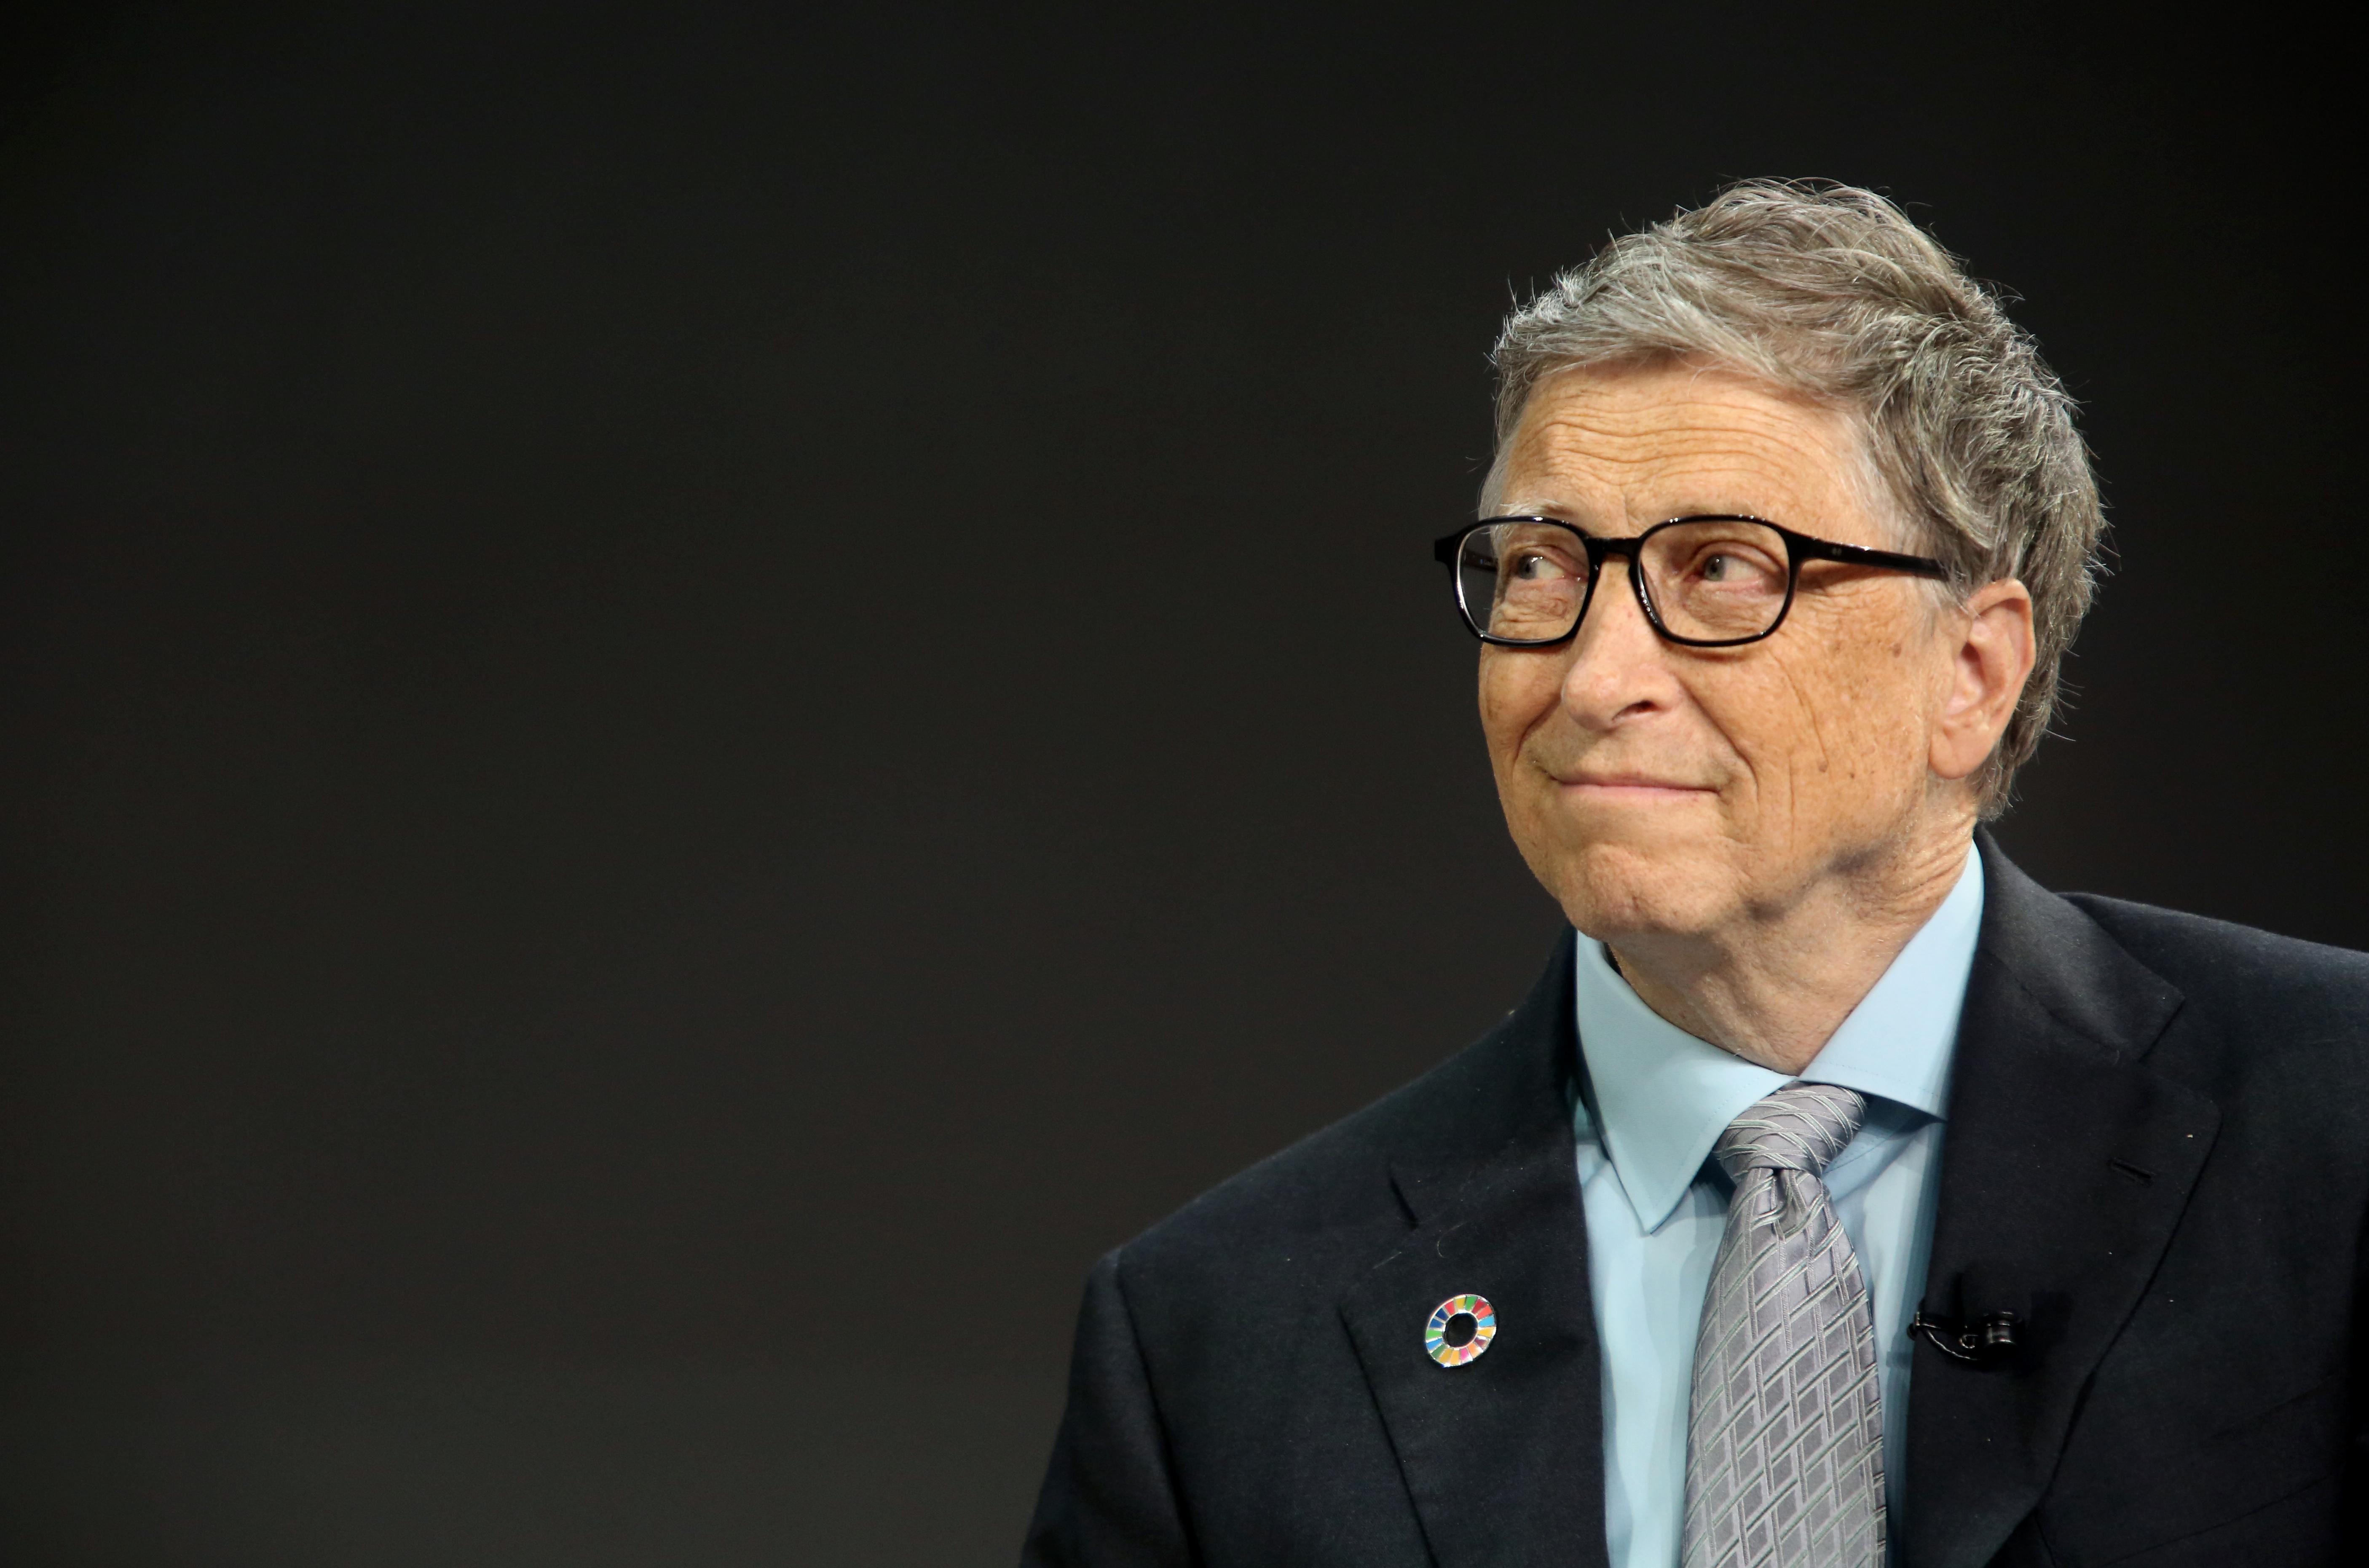 Bill Gates listens to former U.S. President Barack Obama at a Gates Foundation event.